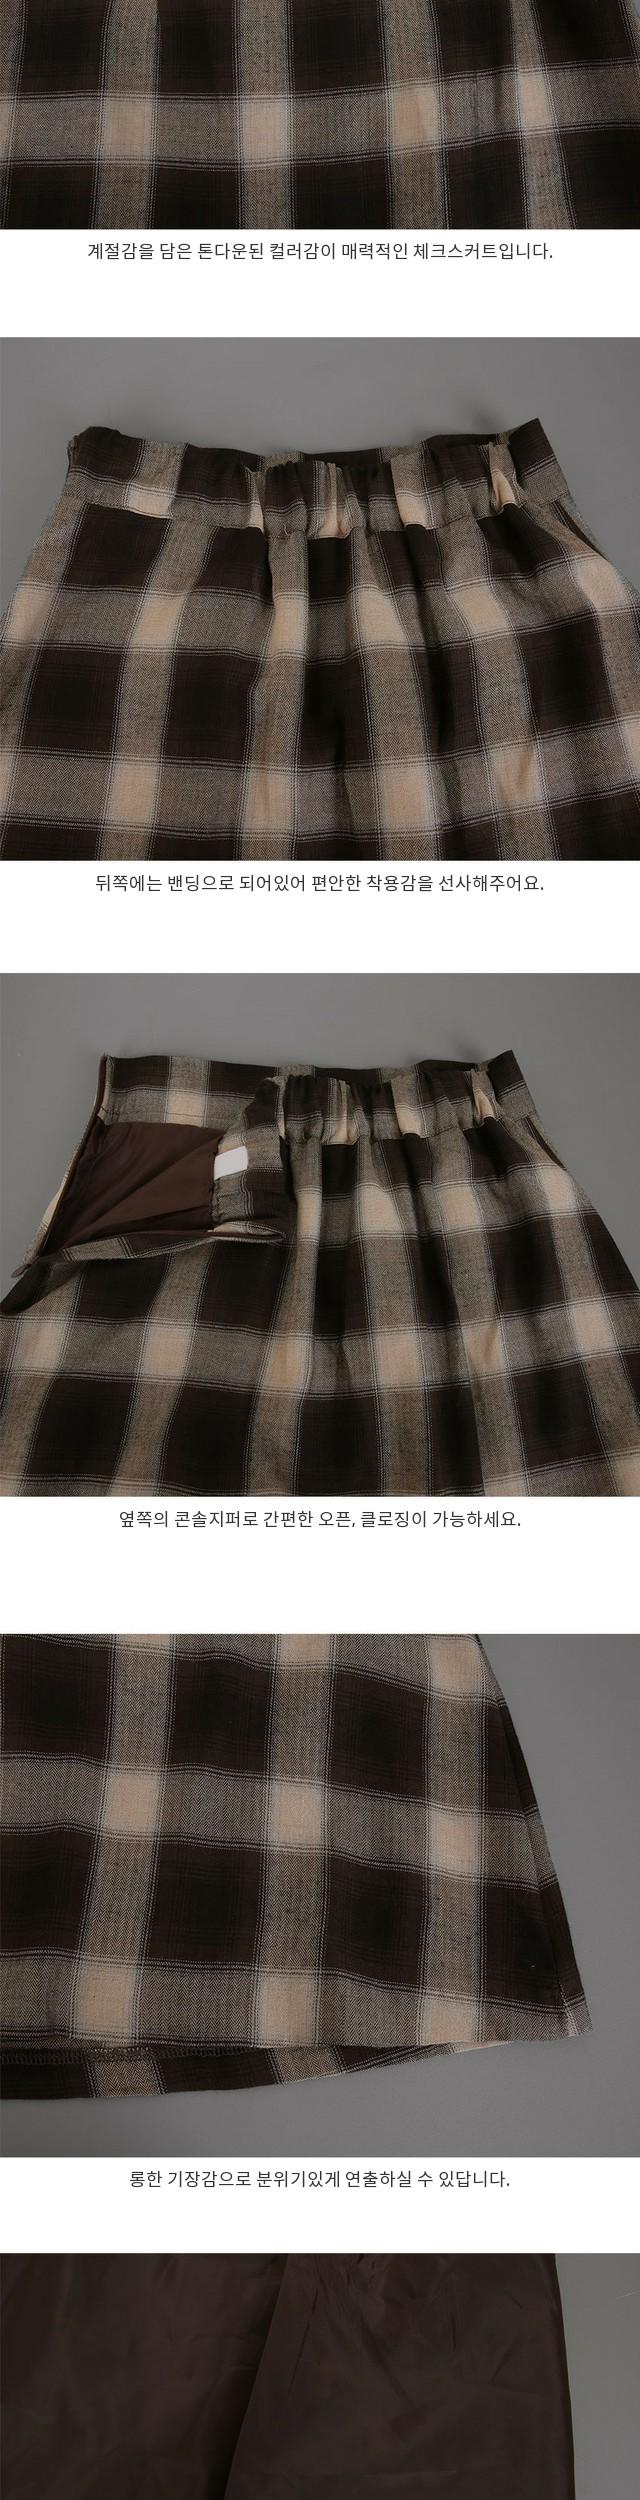 Cookie-check skirt